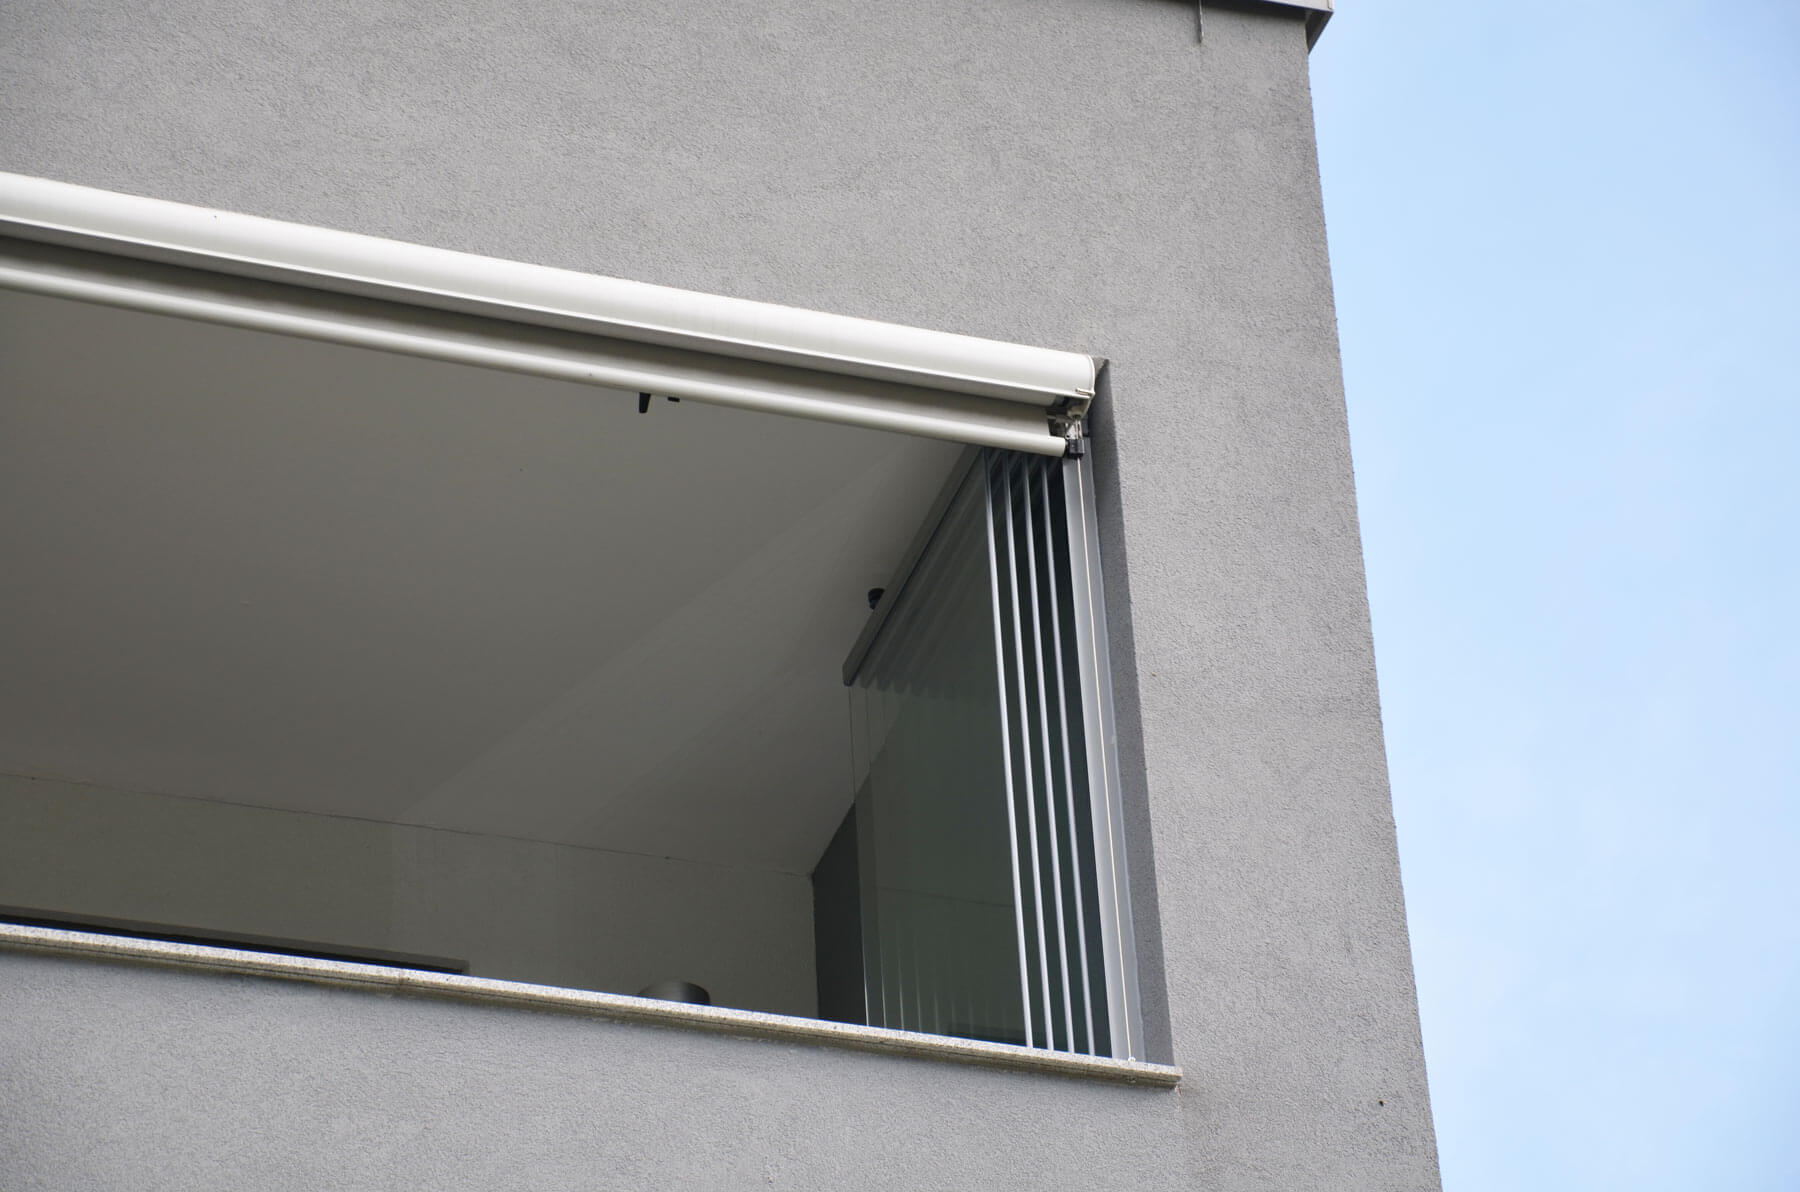 Detail Glas Faltwand Fur Balkon Balkonverglasungen